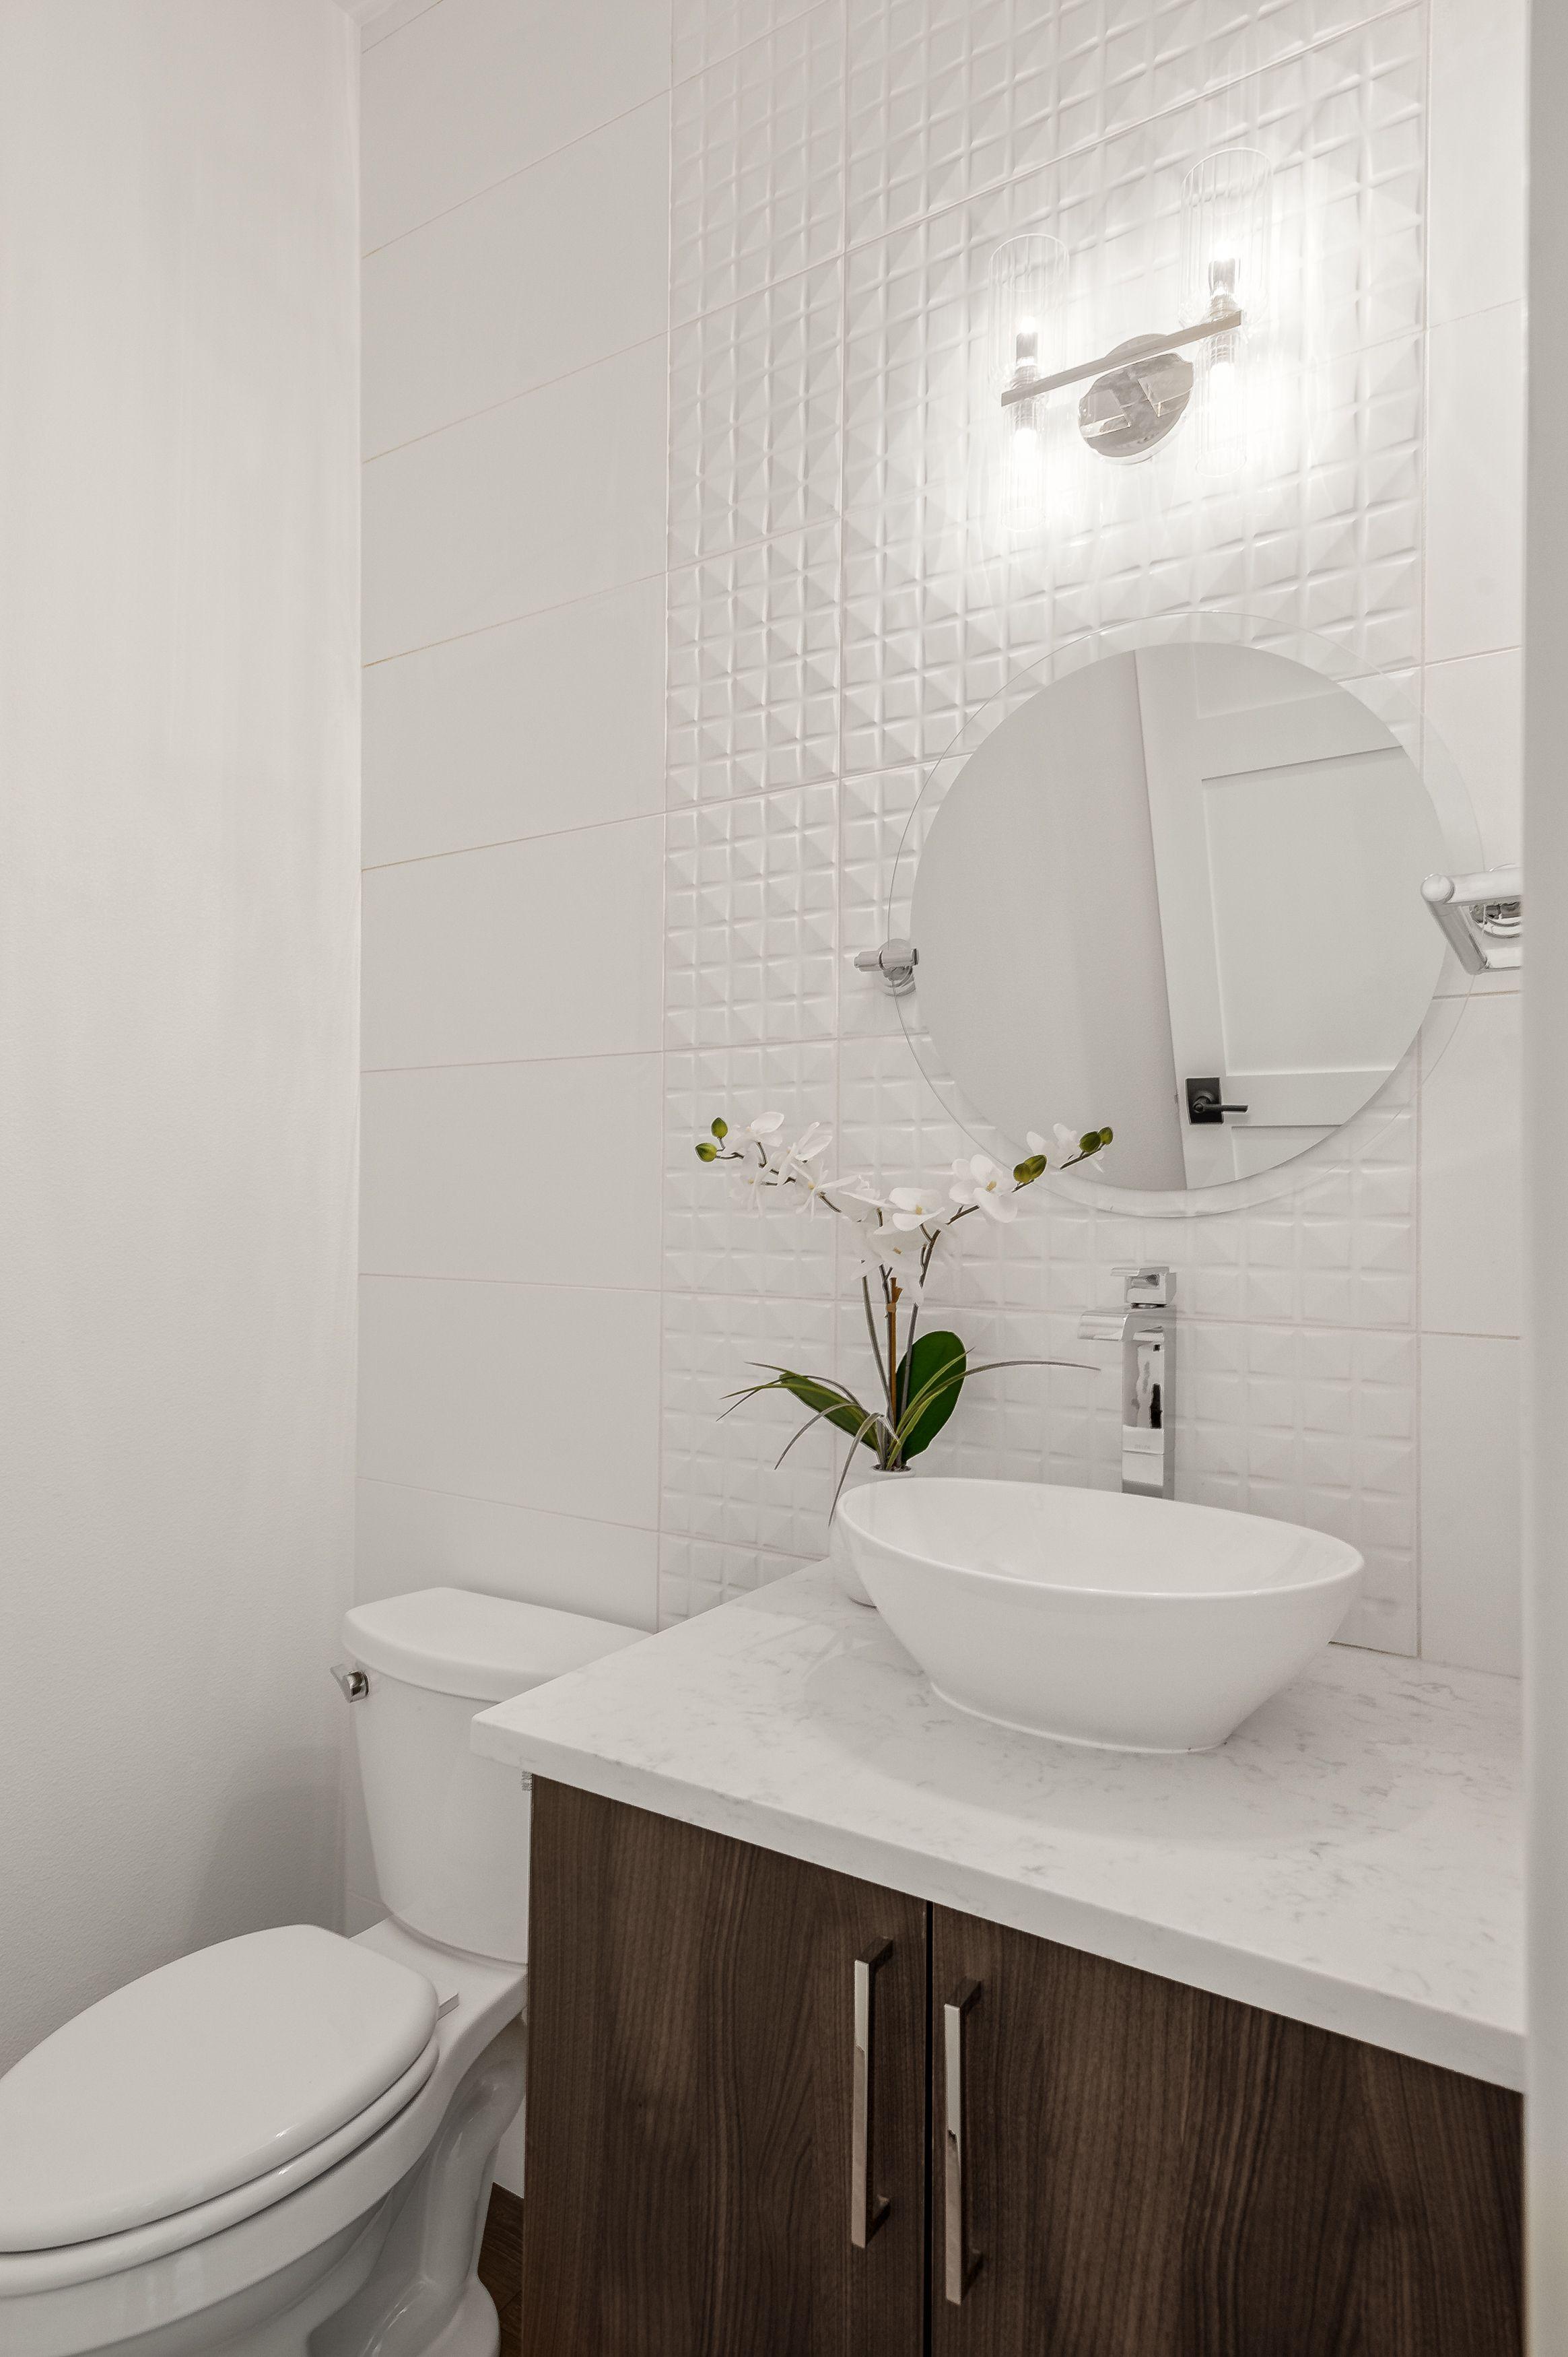 Bathroom featured in the Homesite 6 Birch By Millennial Builders in Bremerton, WA